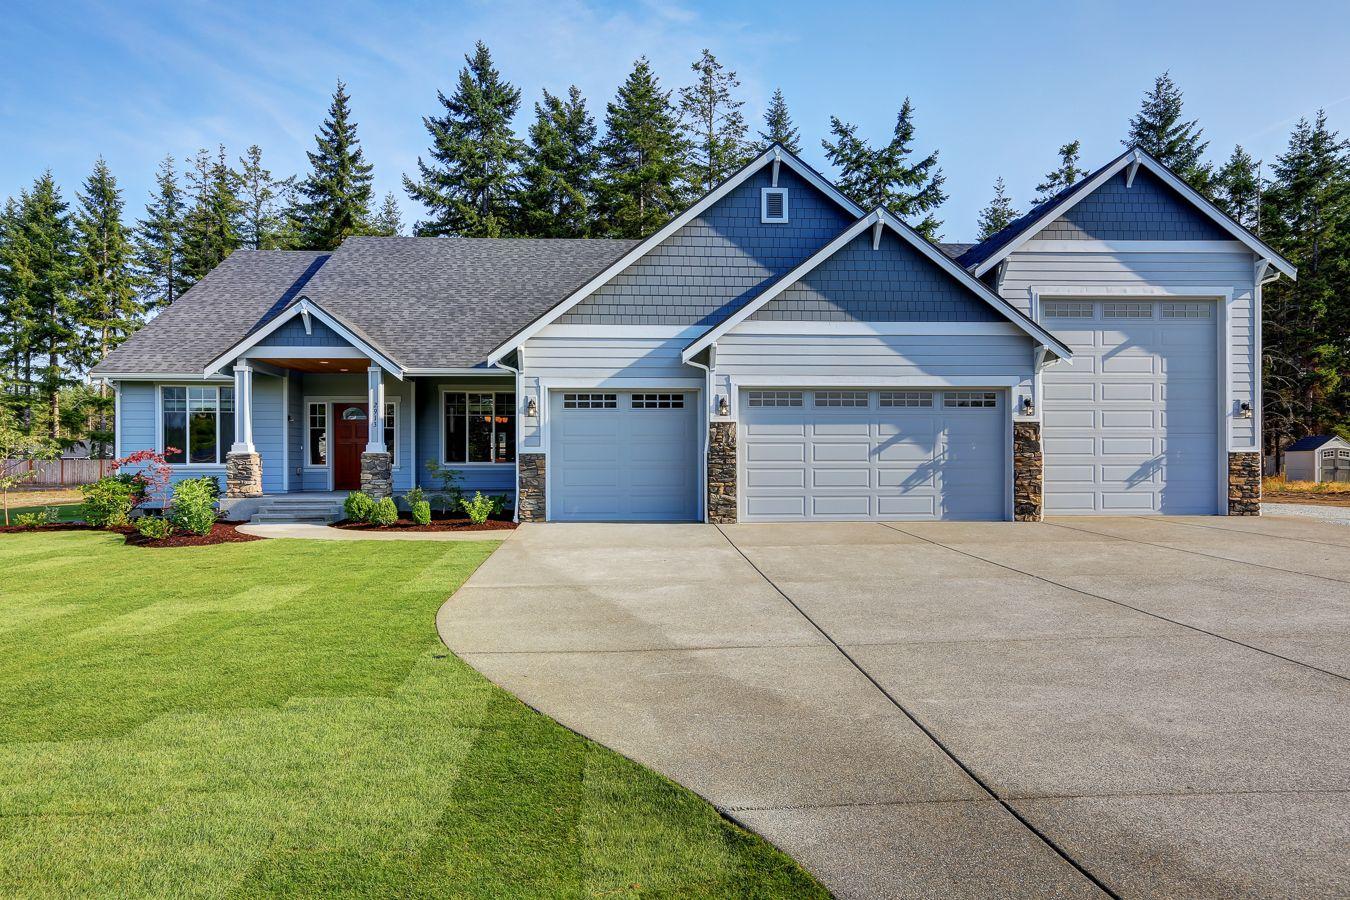 2628 Rambler Plan With An Attached Rv Garage Garage House Plans